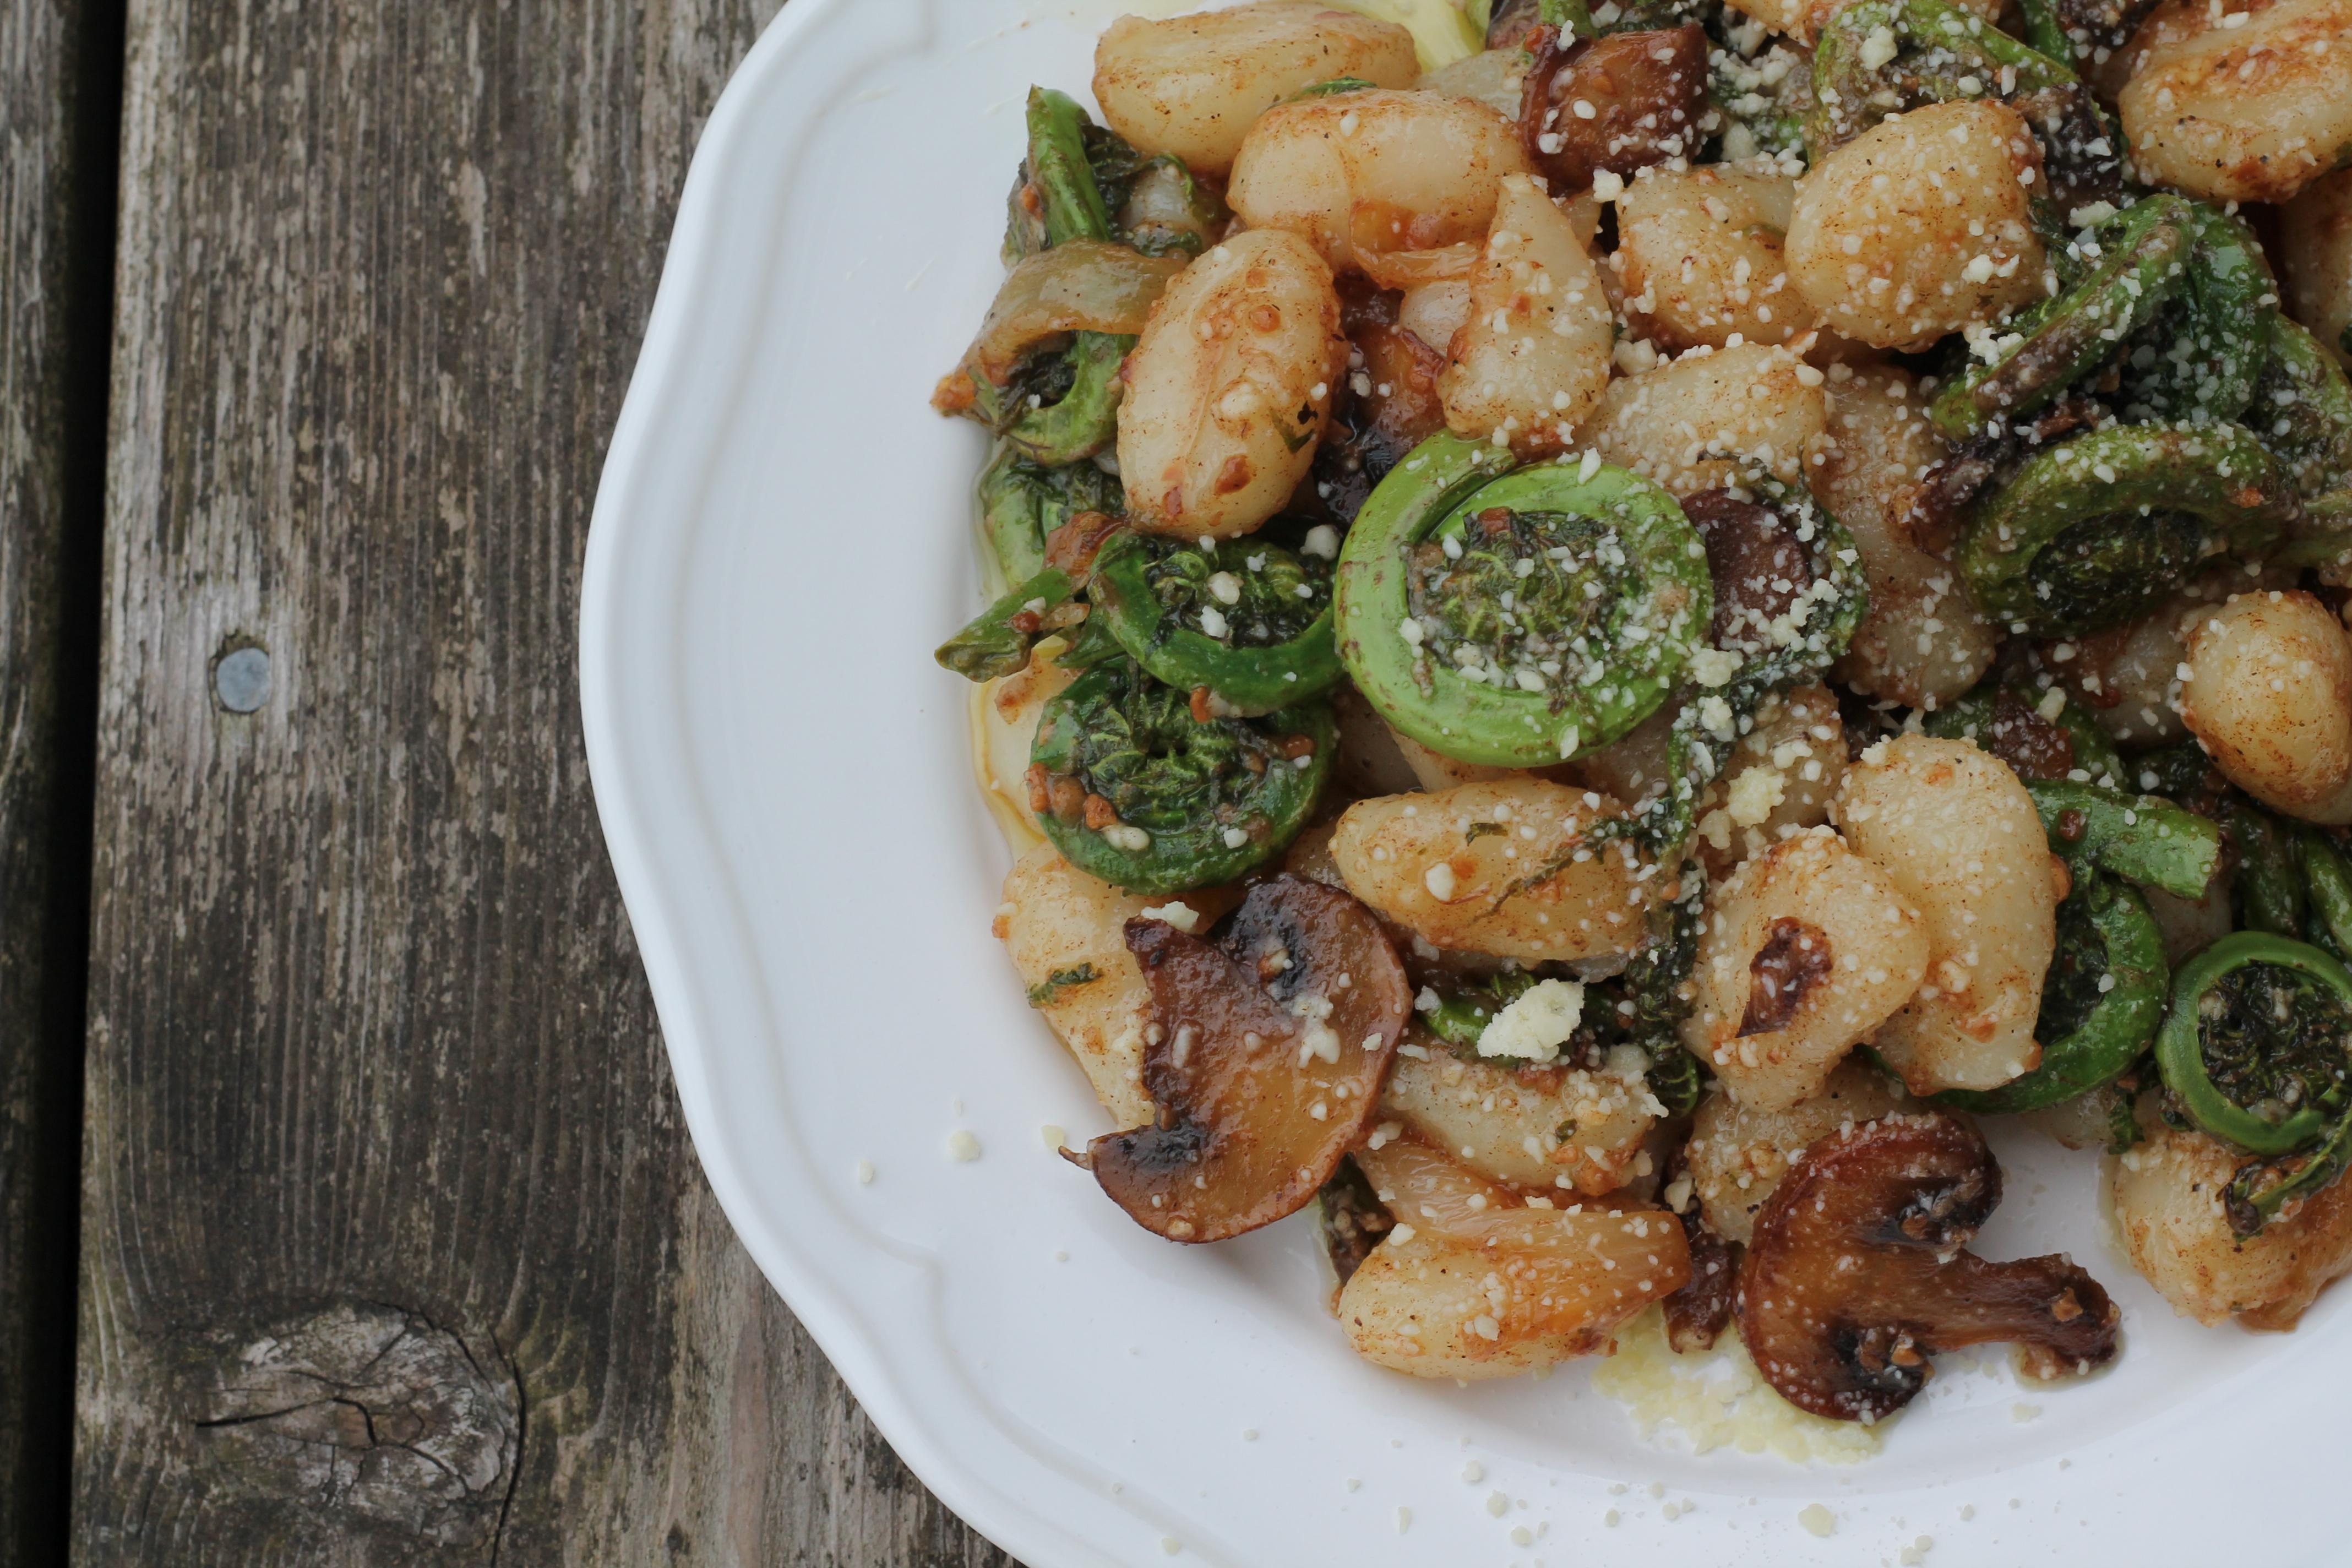 Brown Butter Fiddlehead Mushroom Gnocchi